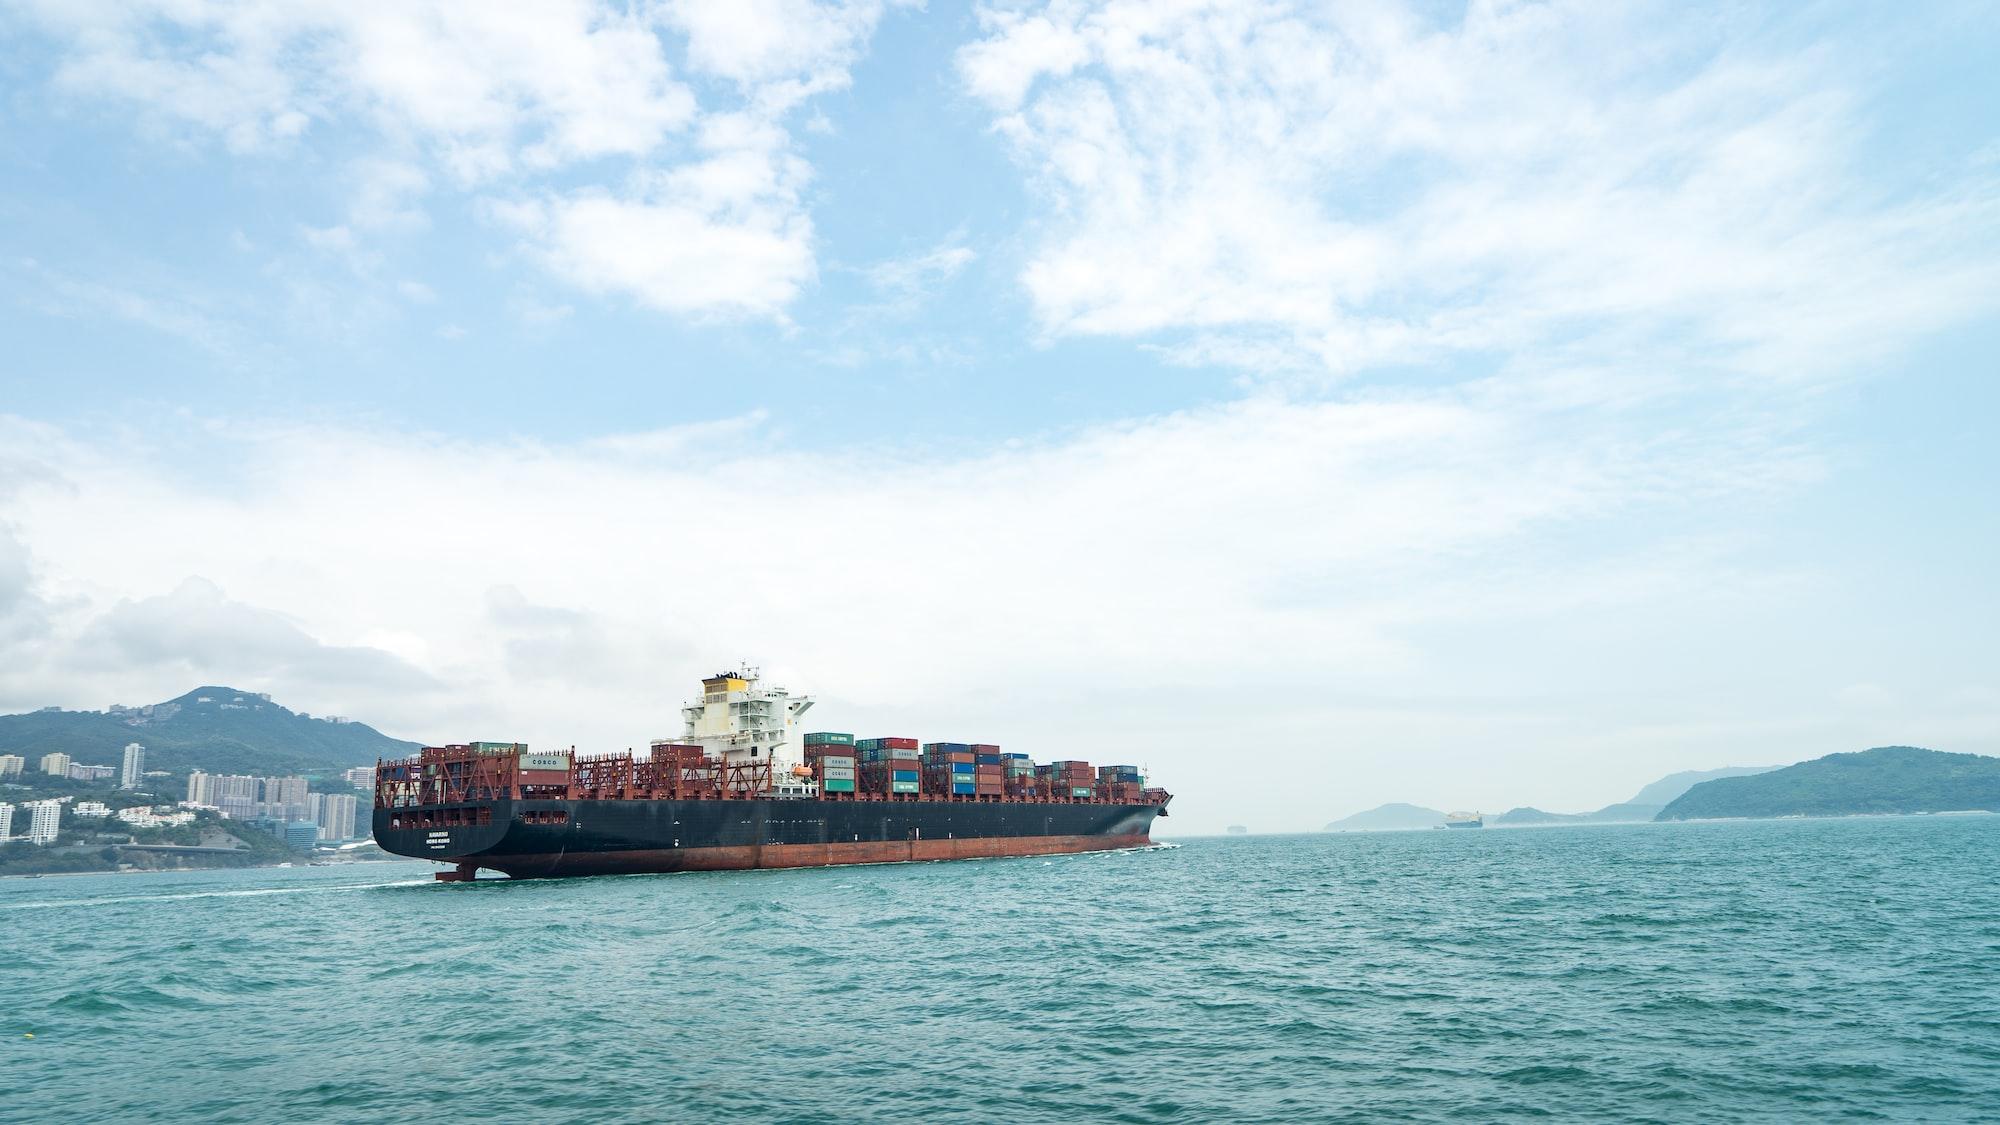 Operations at Port of Lamu kick off